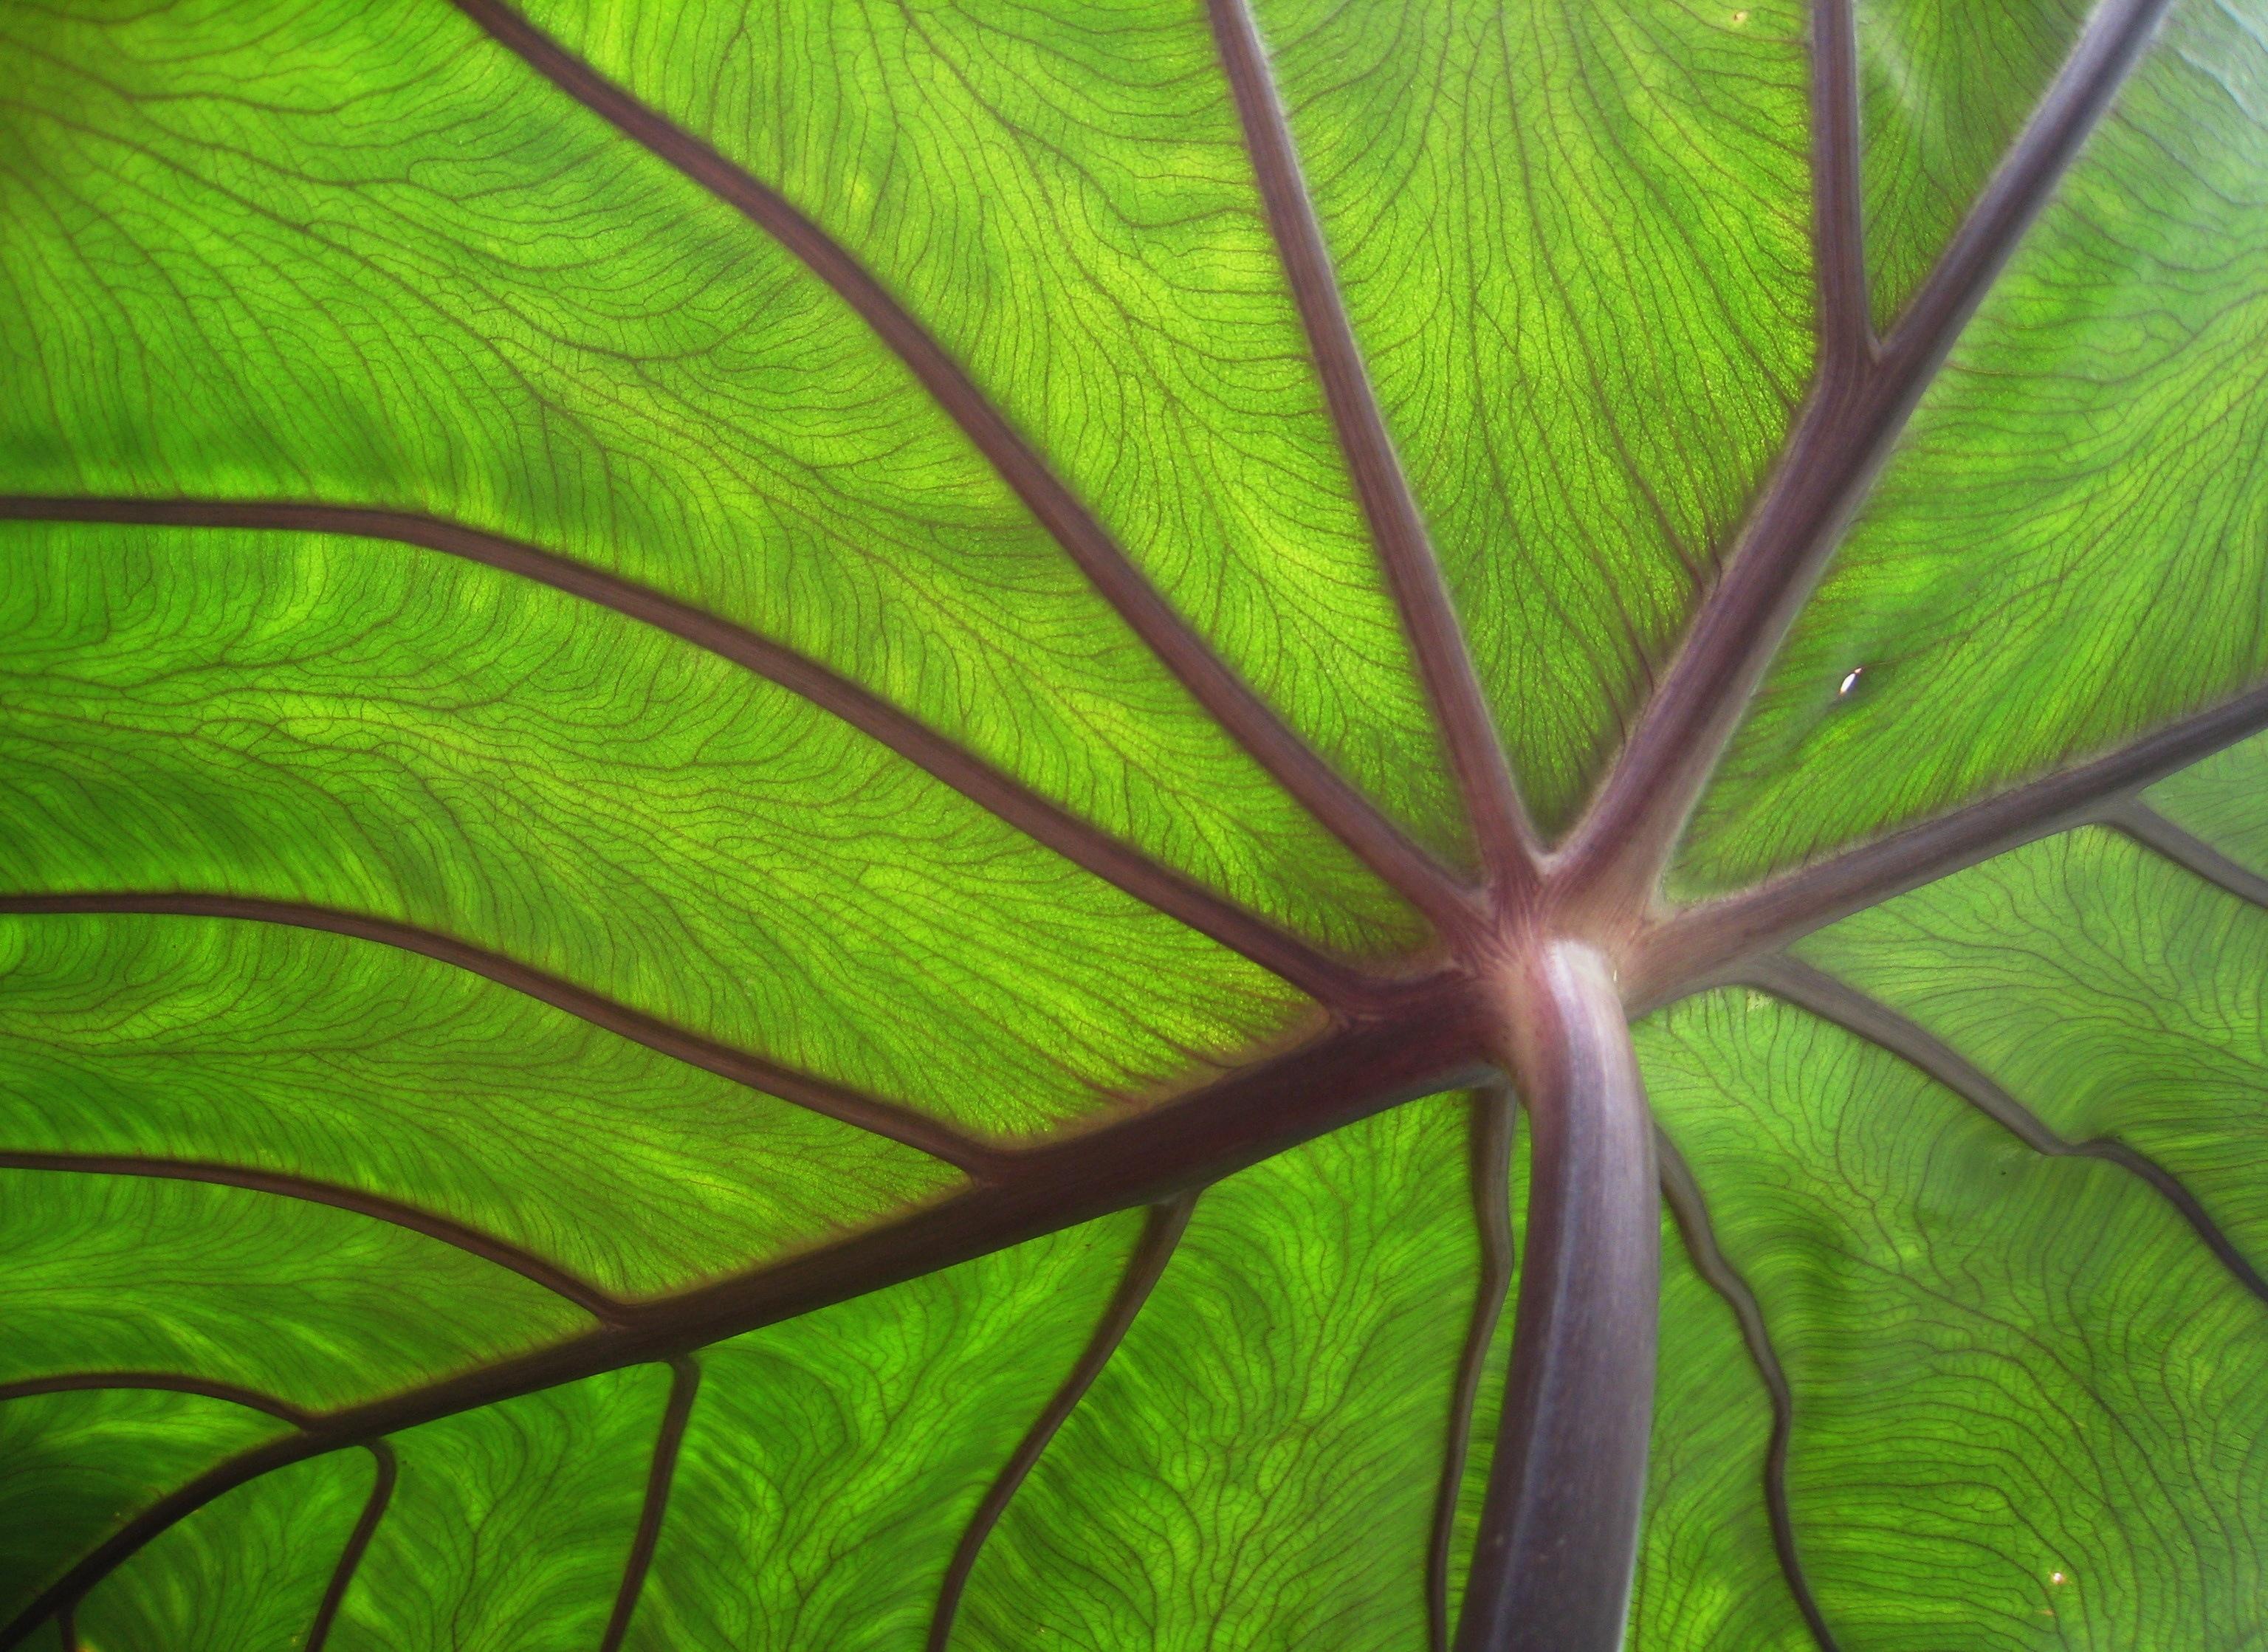 Dosya Taro Leaf Underside Backlit By Sun Edit Jpg